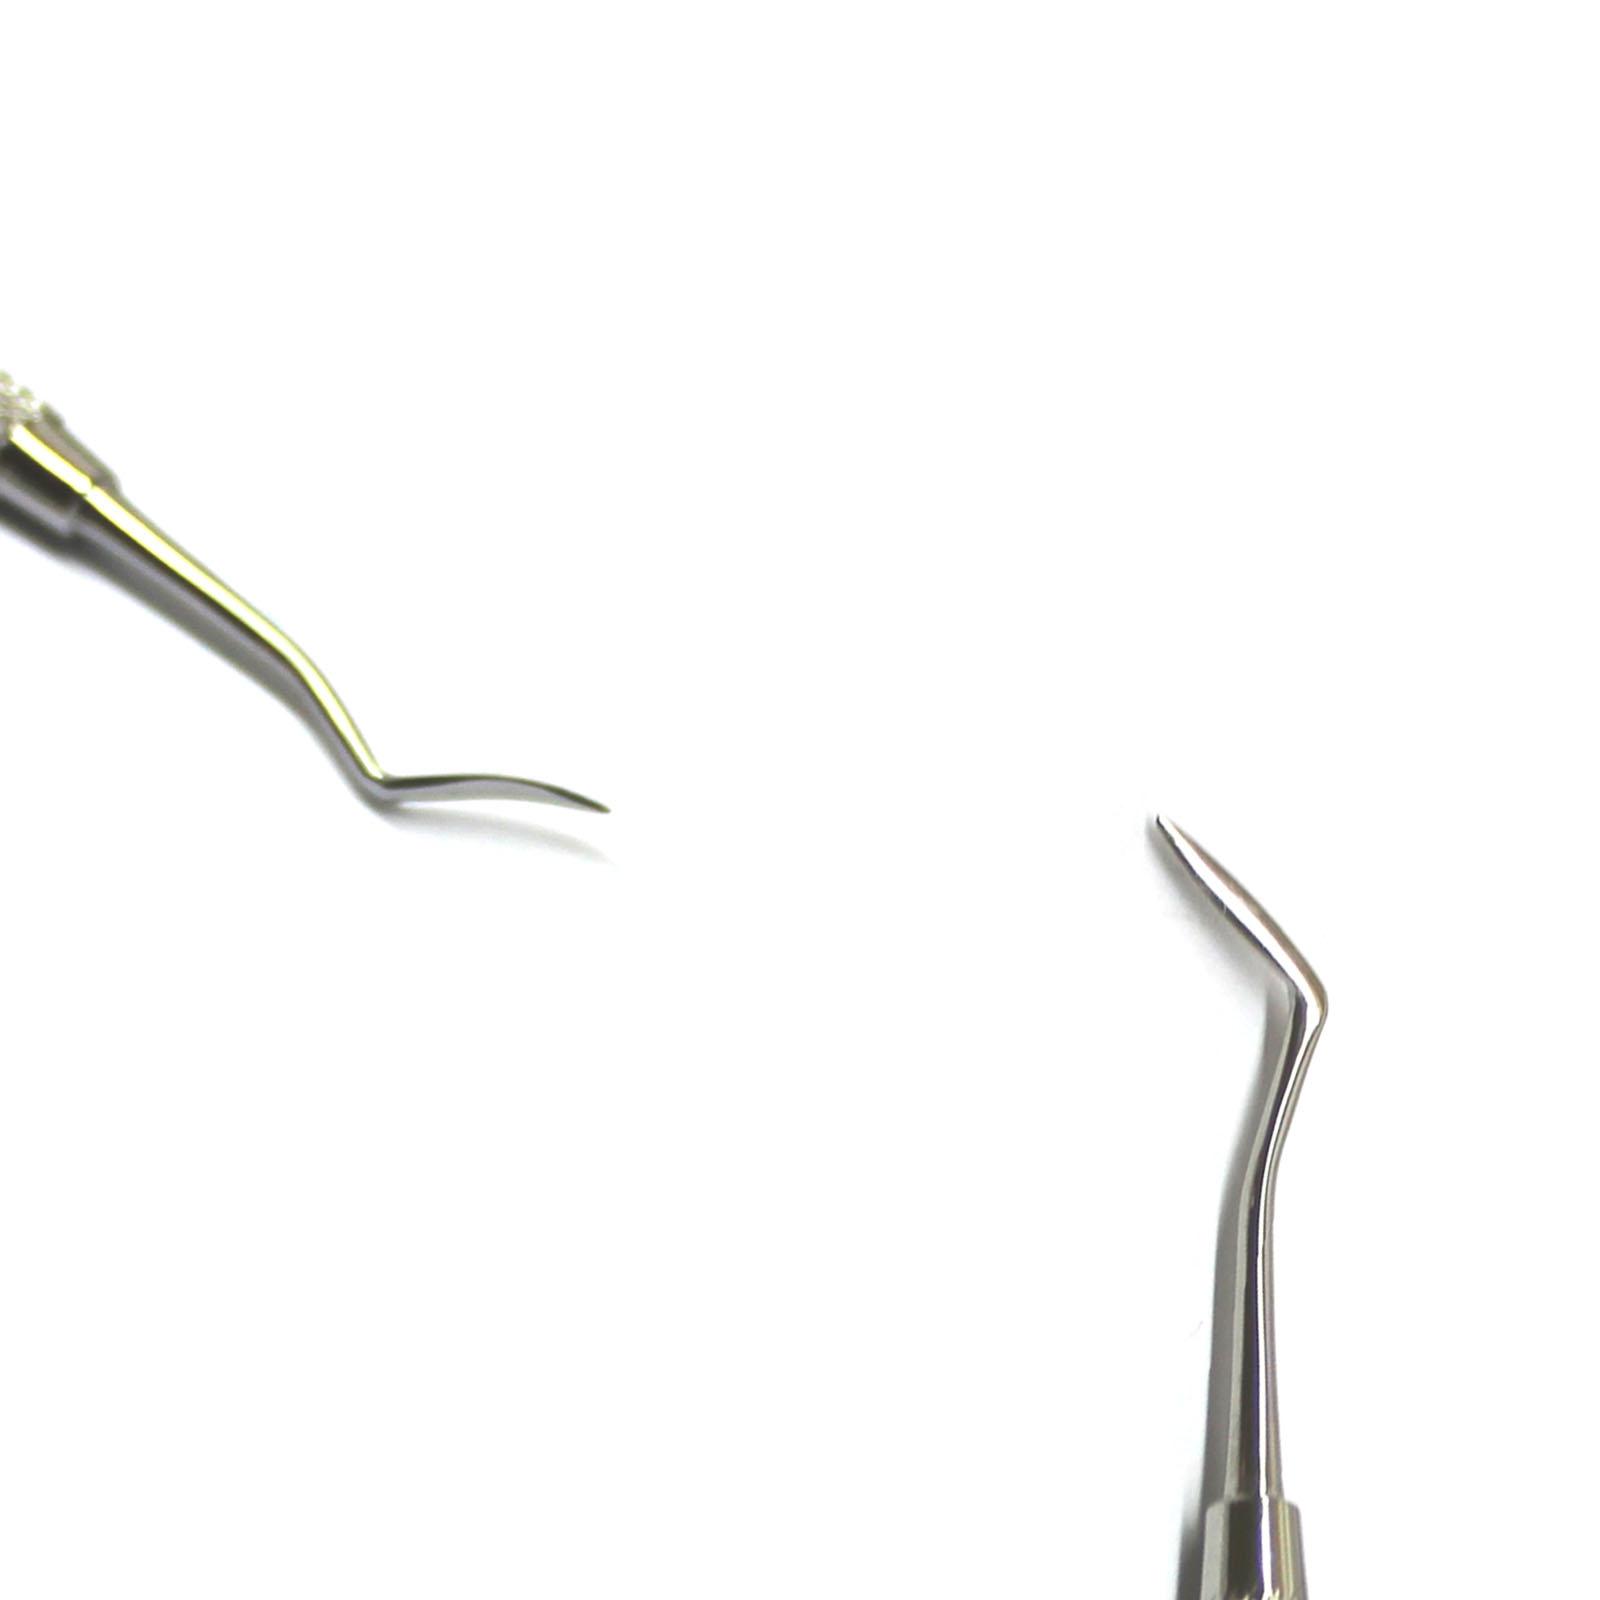 PK Thomas Restorative Dental Filling Instruments PKT4-004 | Shipshape Instruments-384